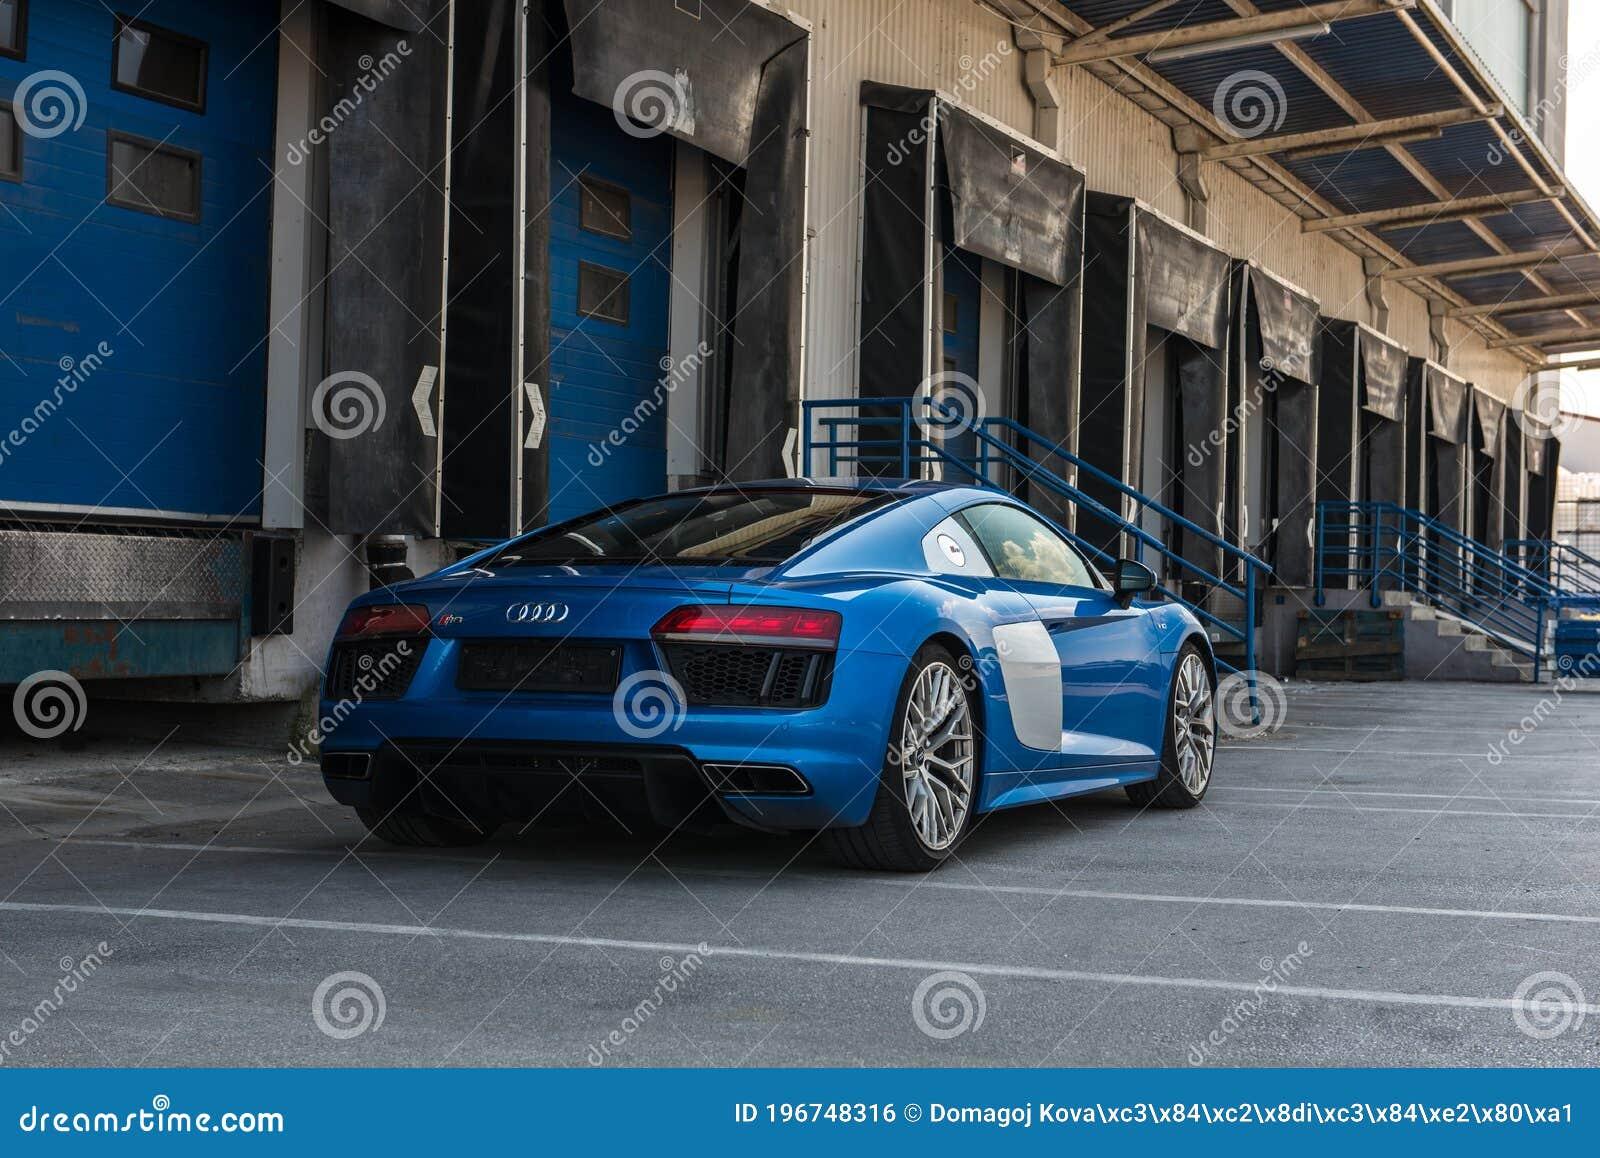 Audi R8 V10 In Blue Colour Audi S Sports Car Luxury R8 Editorial Photo Image Of Zagreb Wallpaper 196748316